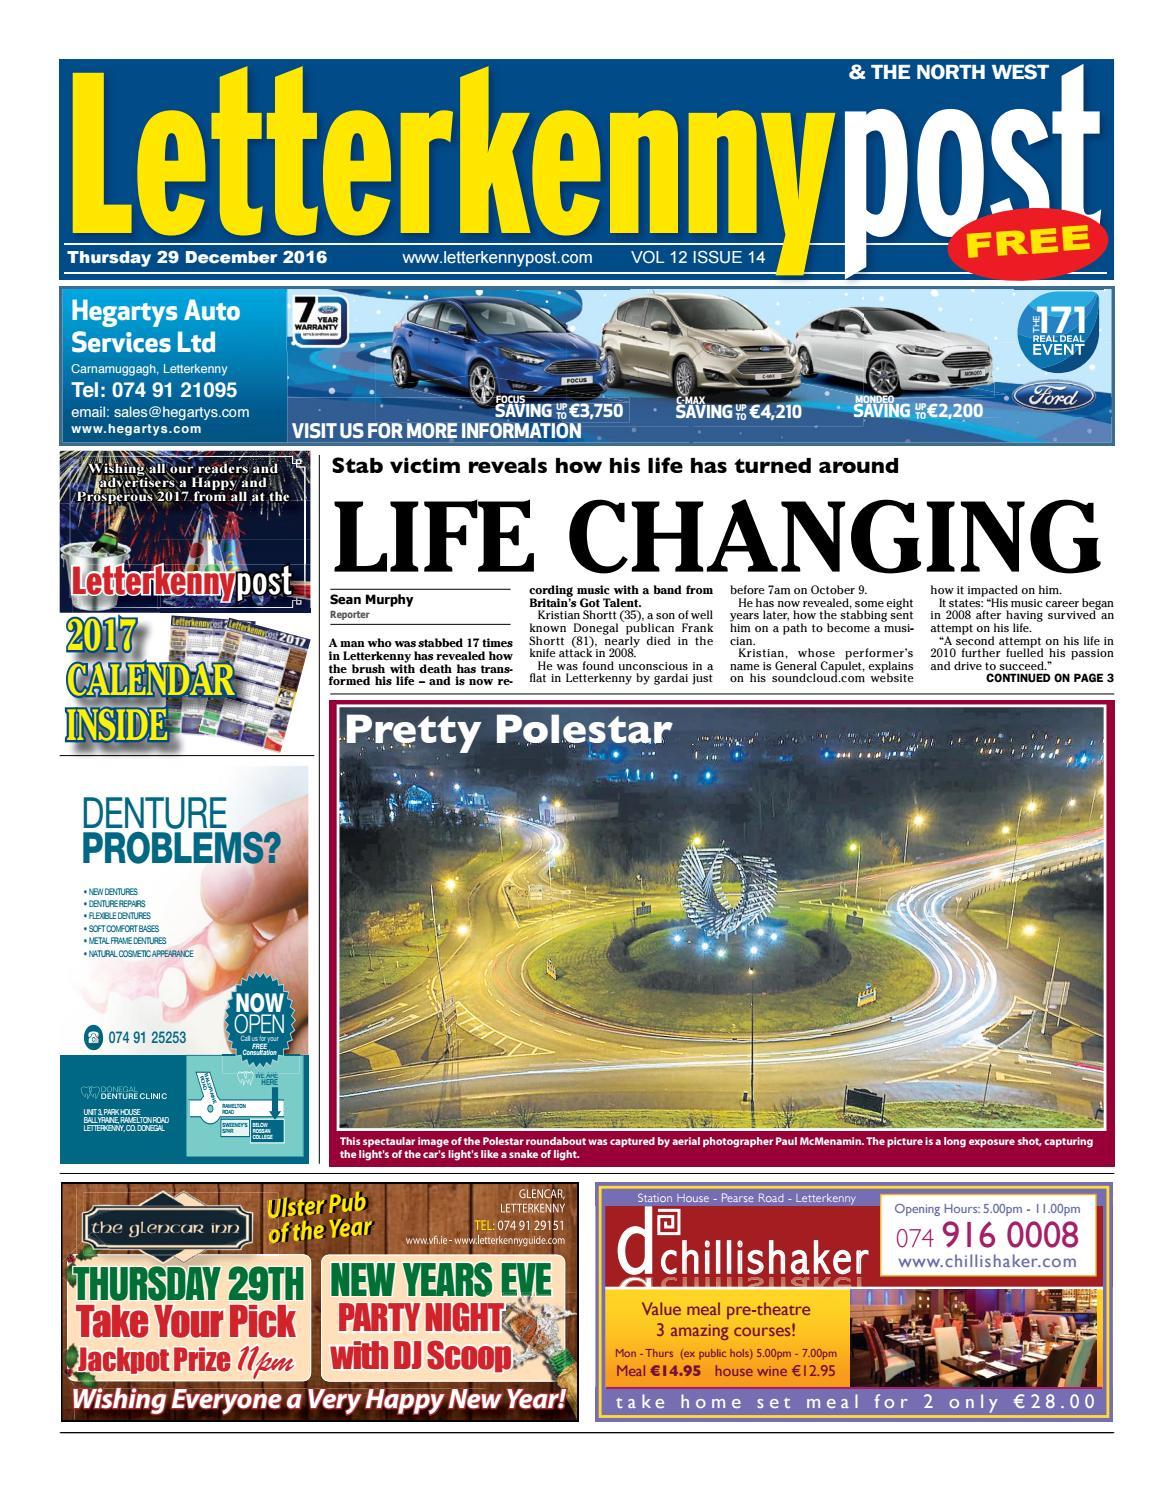 Letterkenny Post 29 12 16 By River Media Newspapers Issuu Voucher Mcd 50000 Mcdonalds